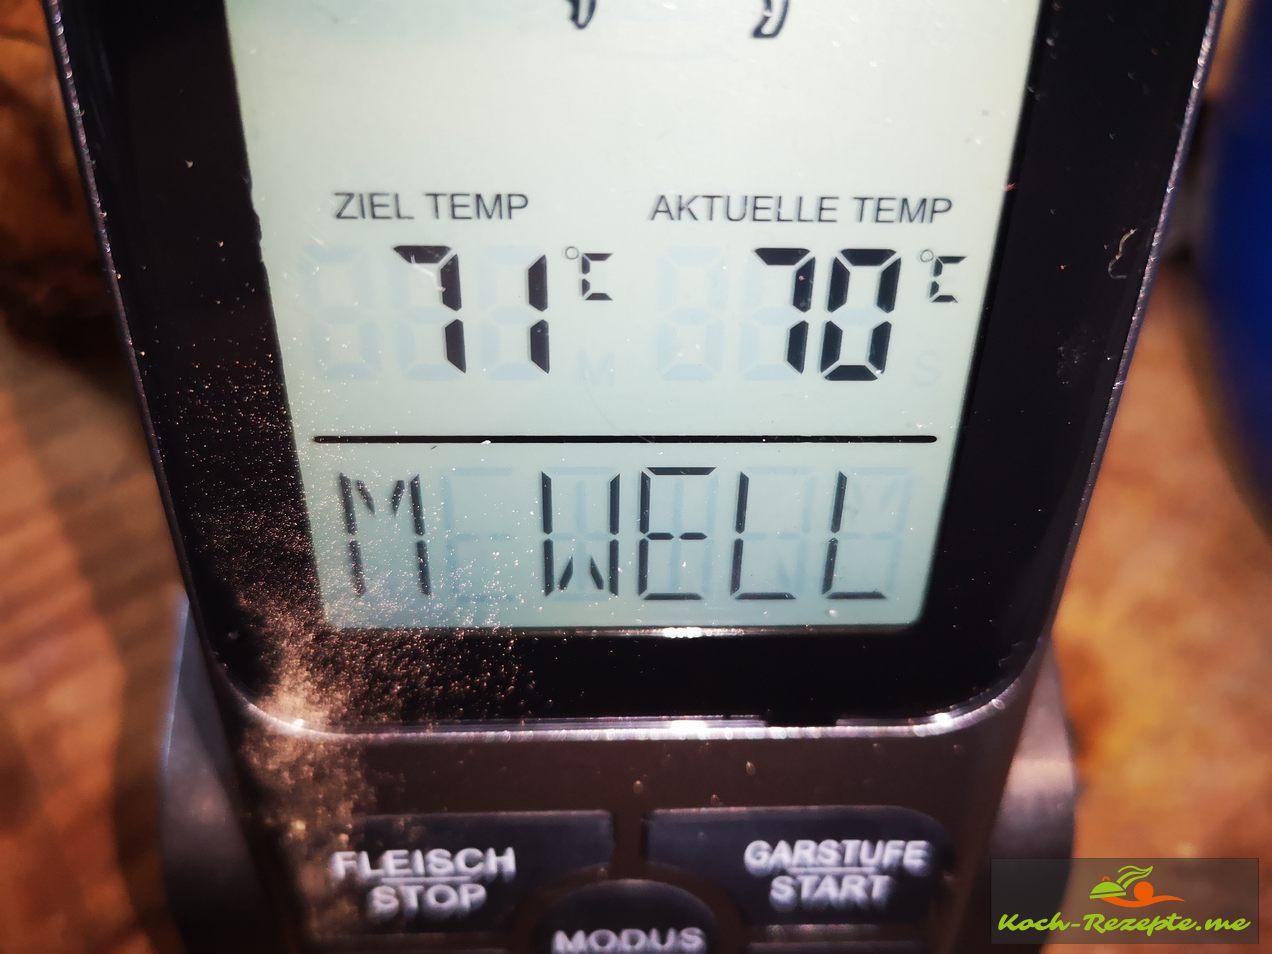 Öl auf 70-75 Grad erwärmen